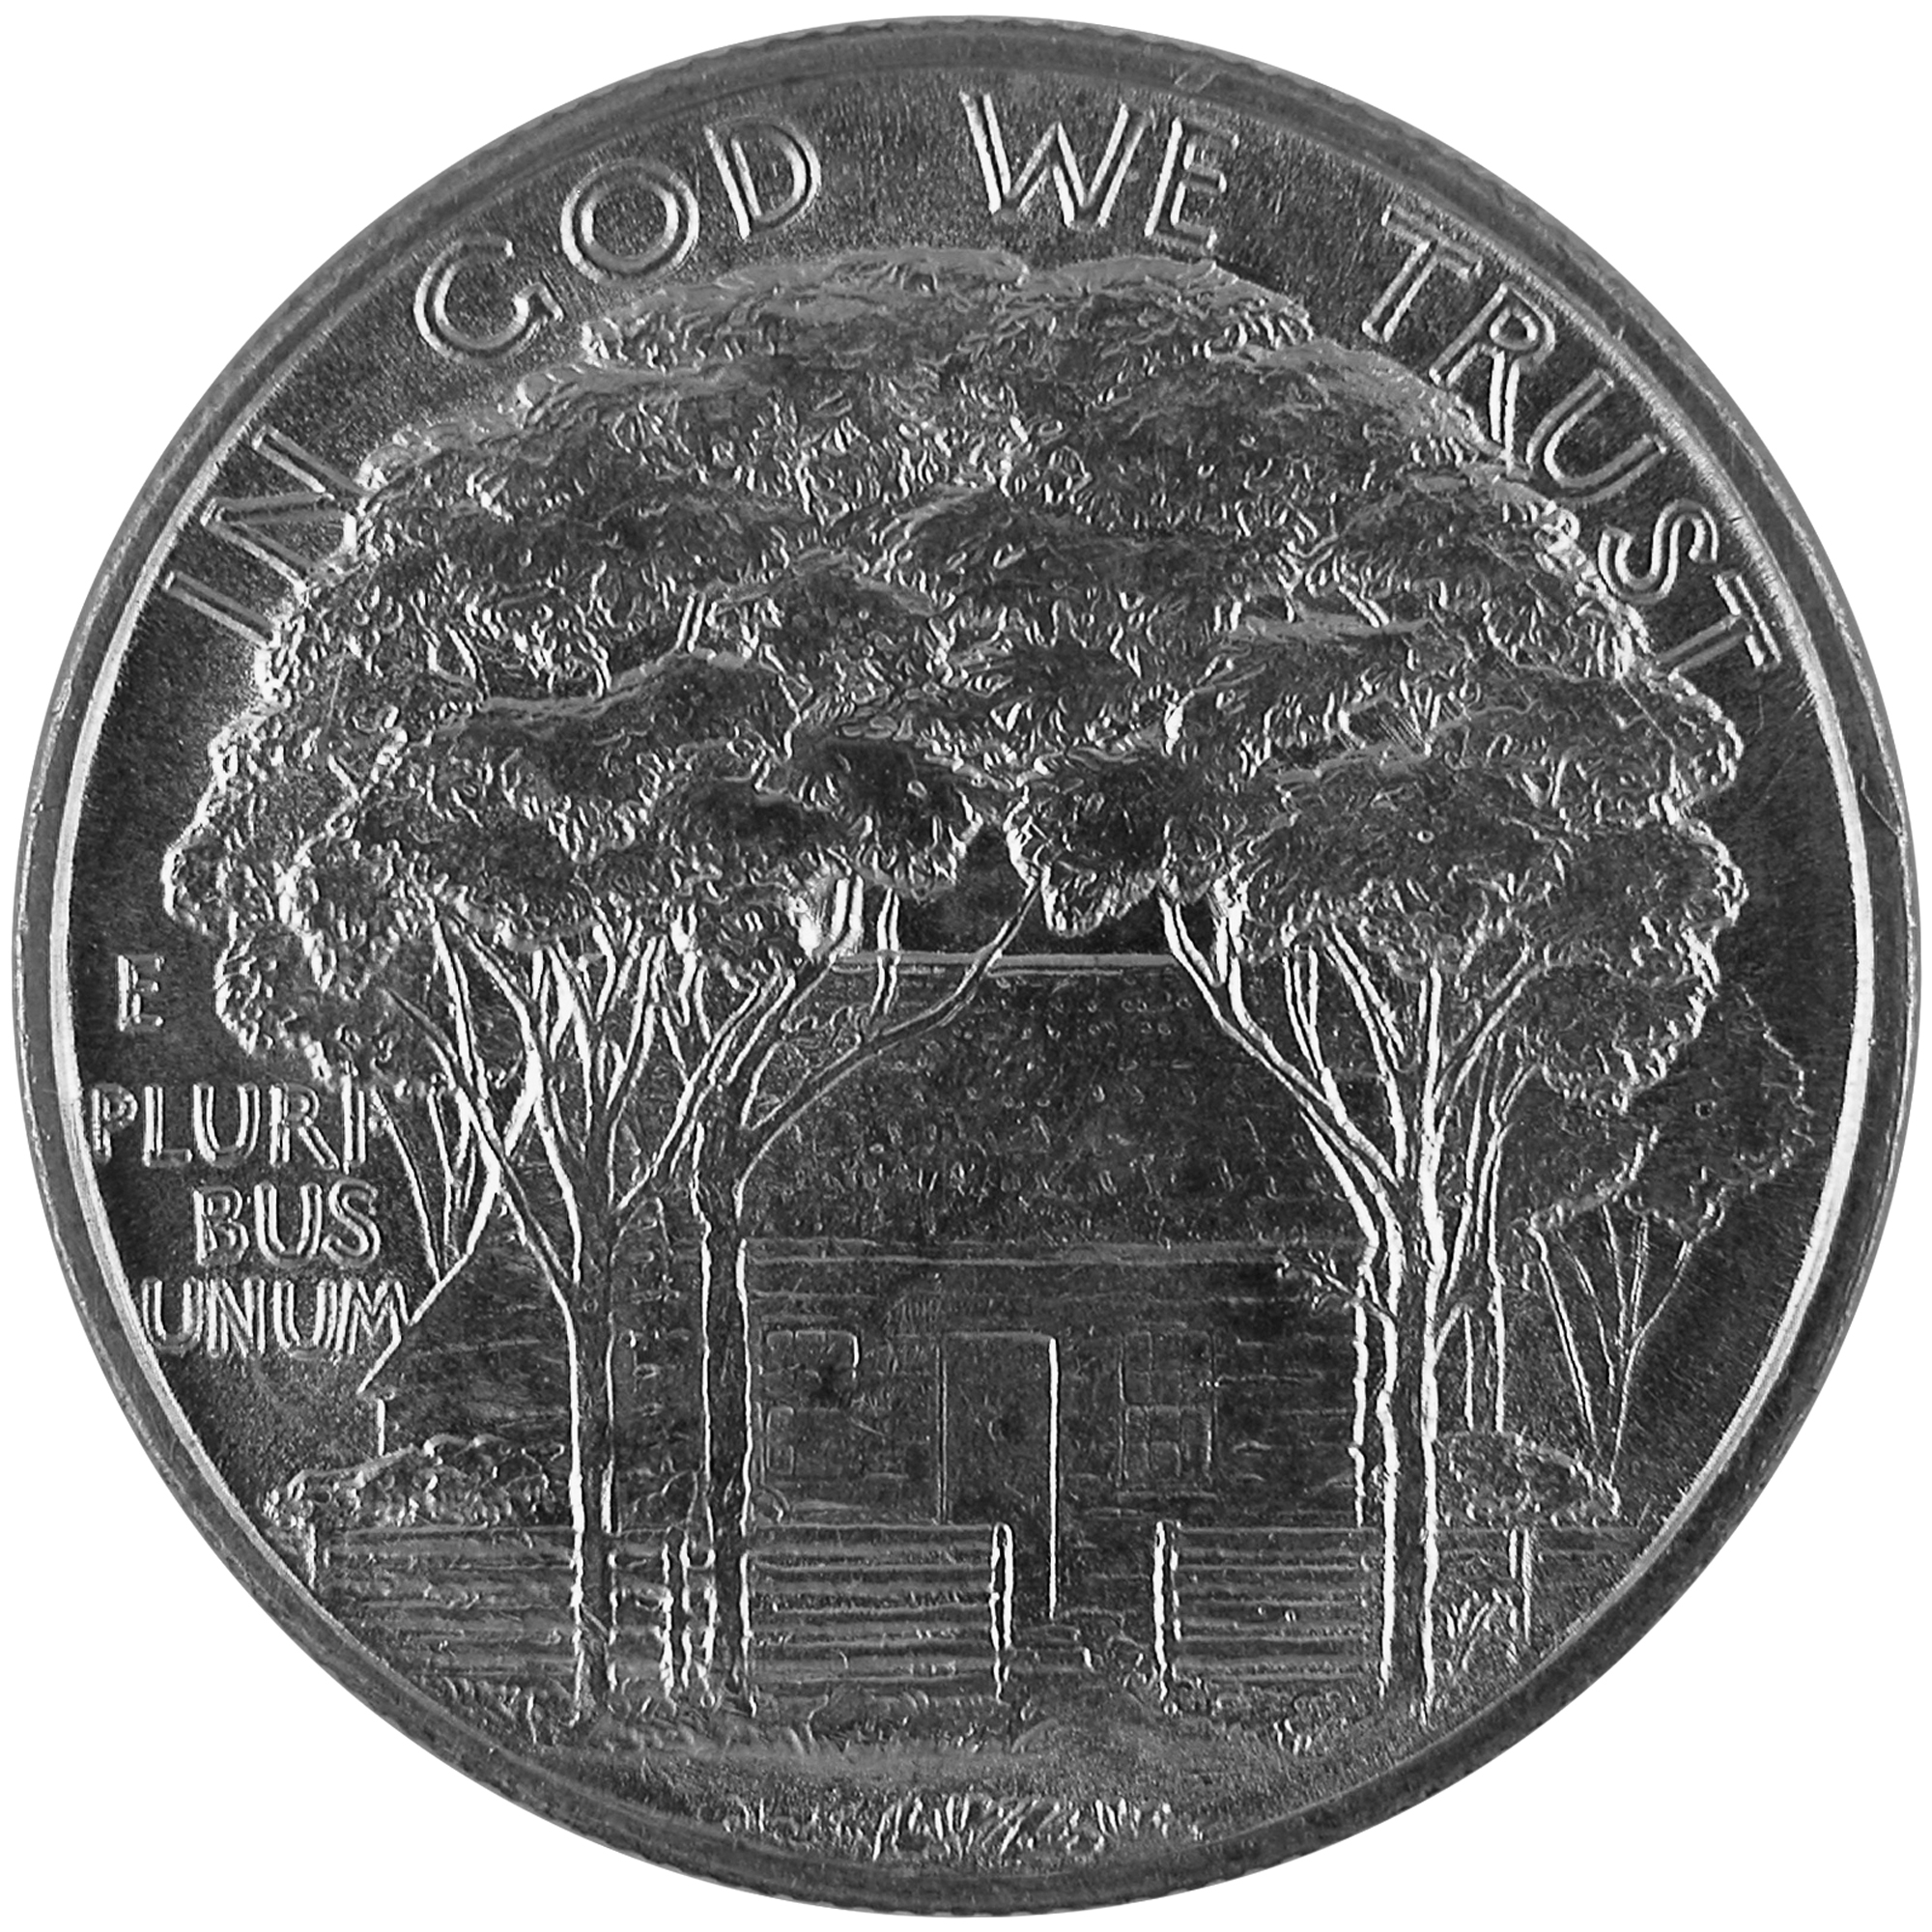 1922 Ulysses S. Grant Memorial Commemorative Silver Half Dollar Coin Reverse